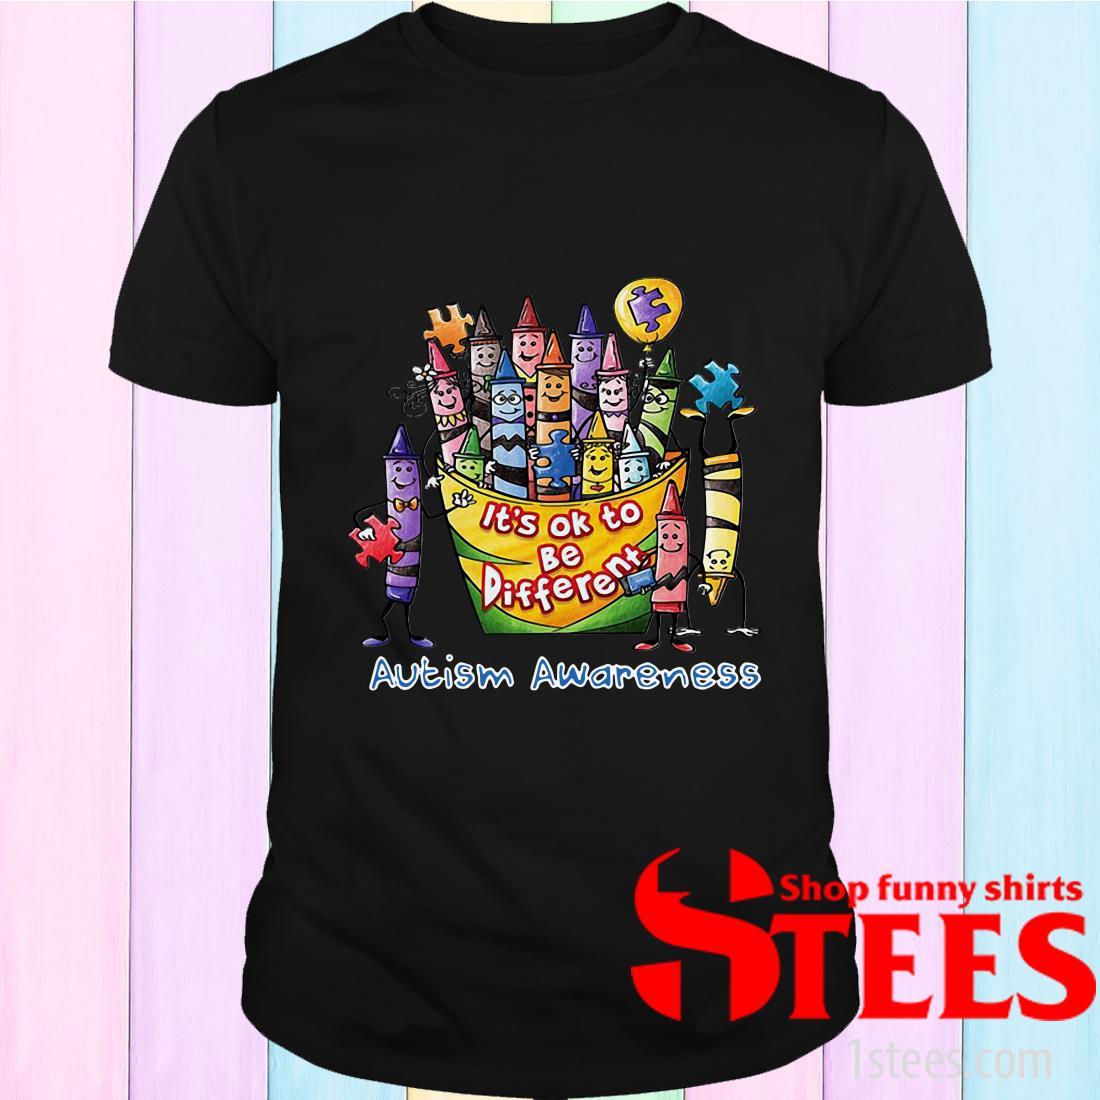 It's Ok To Be Diferent Autism Awareness T-Shirt